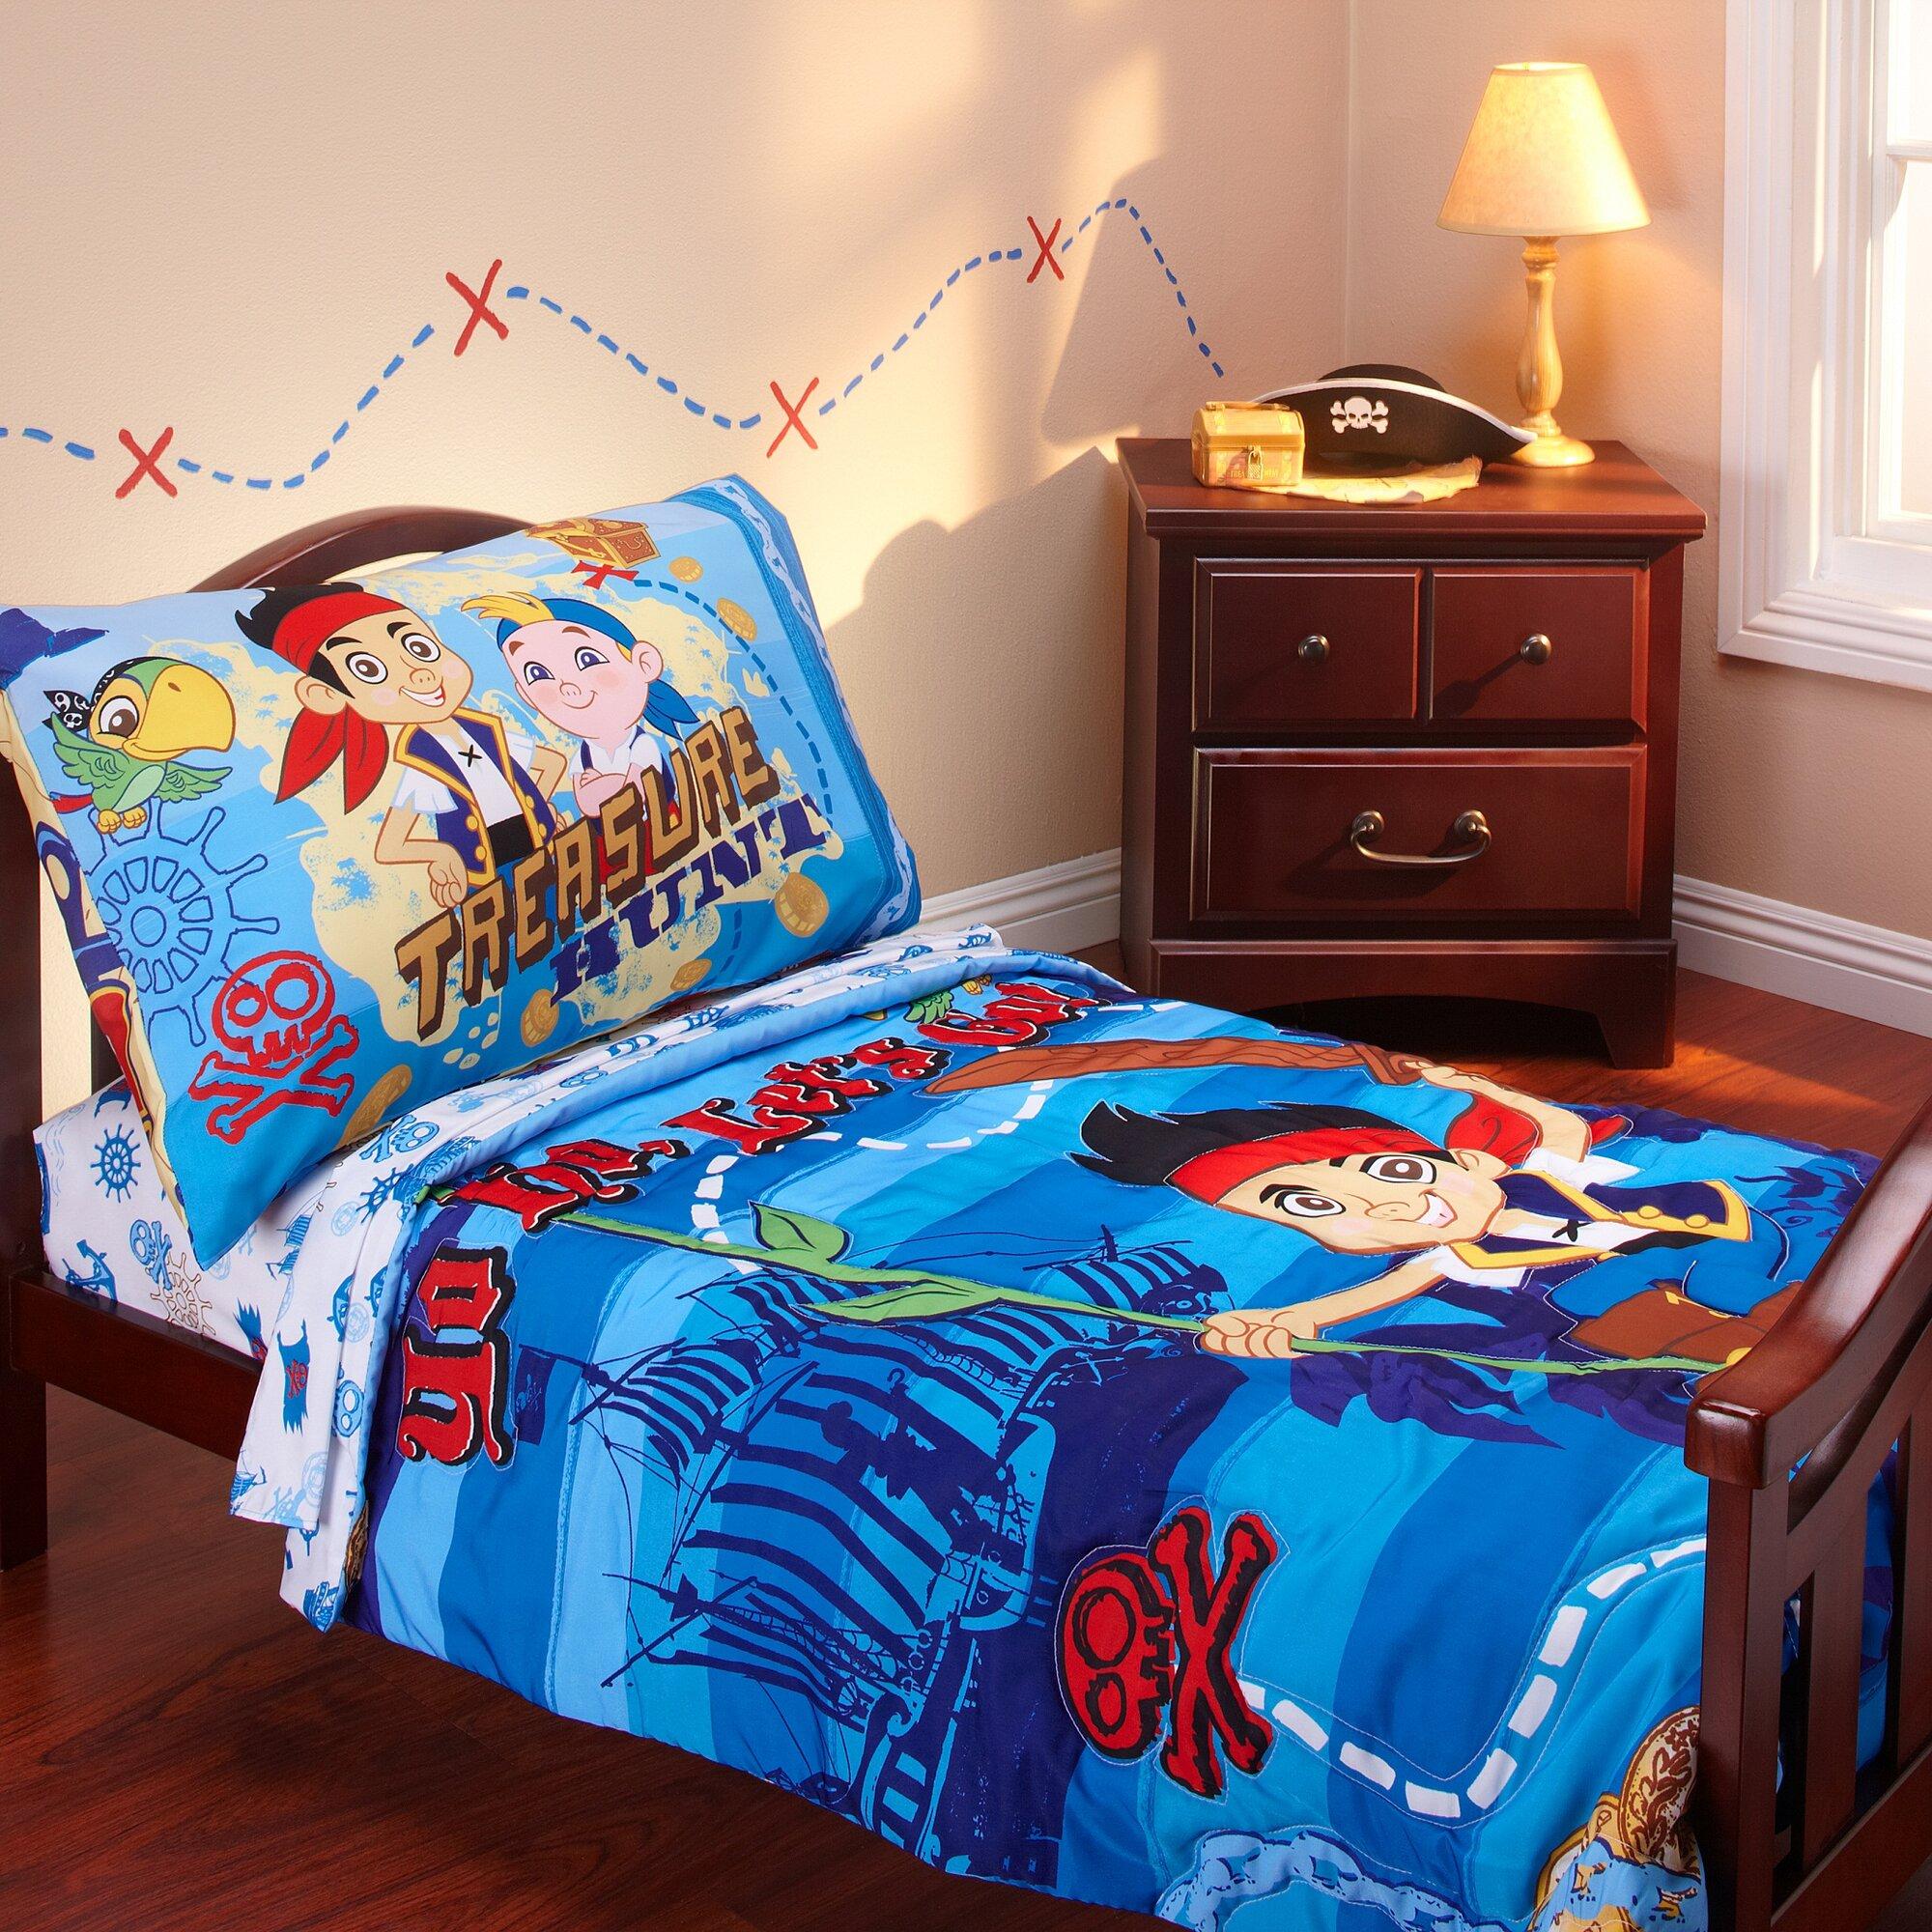 Disney Jake and the Neverland Pirates 4 Piece Toddler Bedding Set ...